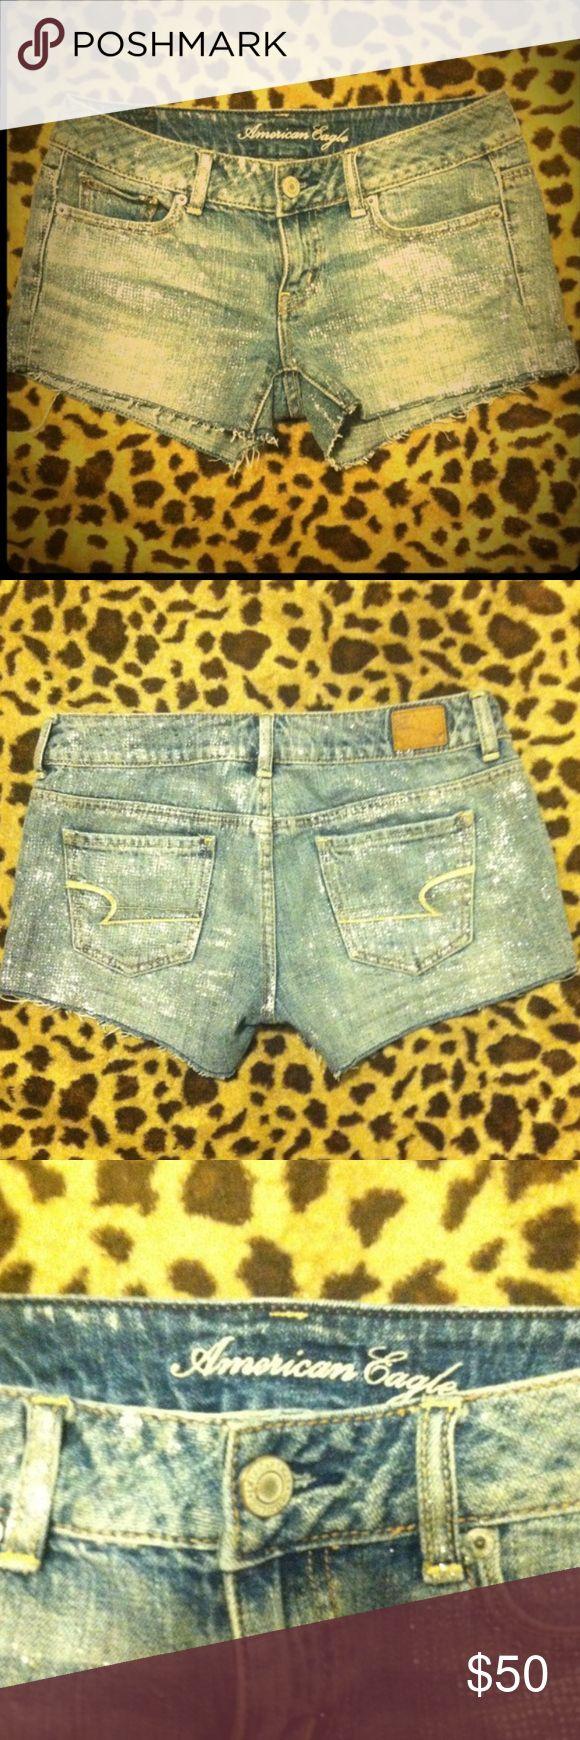 💎🆕American Eagle glitter shorts💎size 2💎 💎🆕American Eagle glitter shorts💎size 2💎new without tags💎the glitter sparkles💎so cute American Eagle Outfitters Shorts Jean Shorts